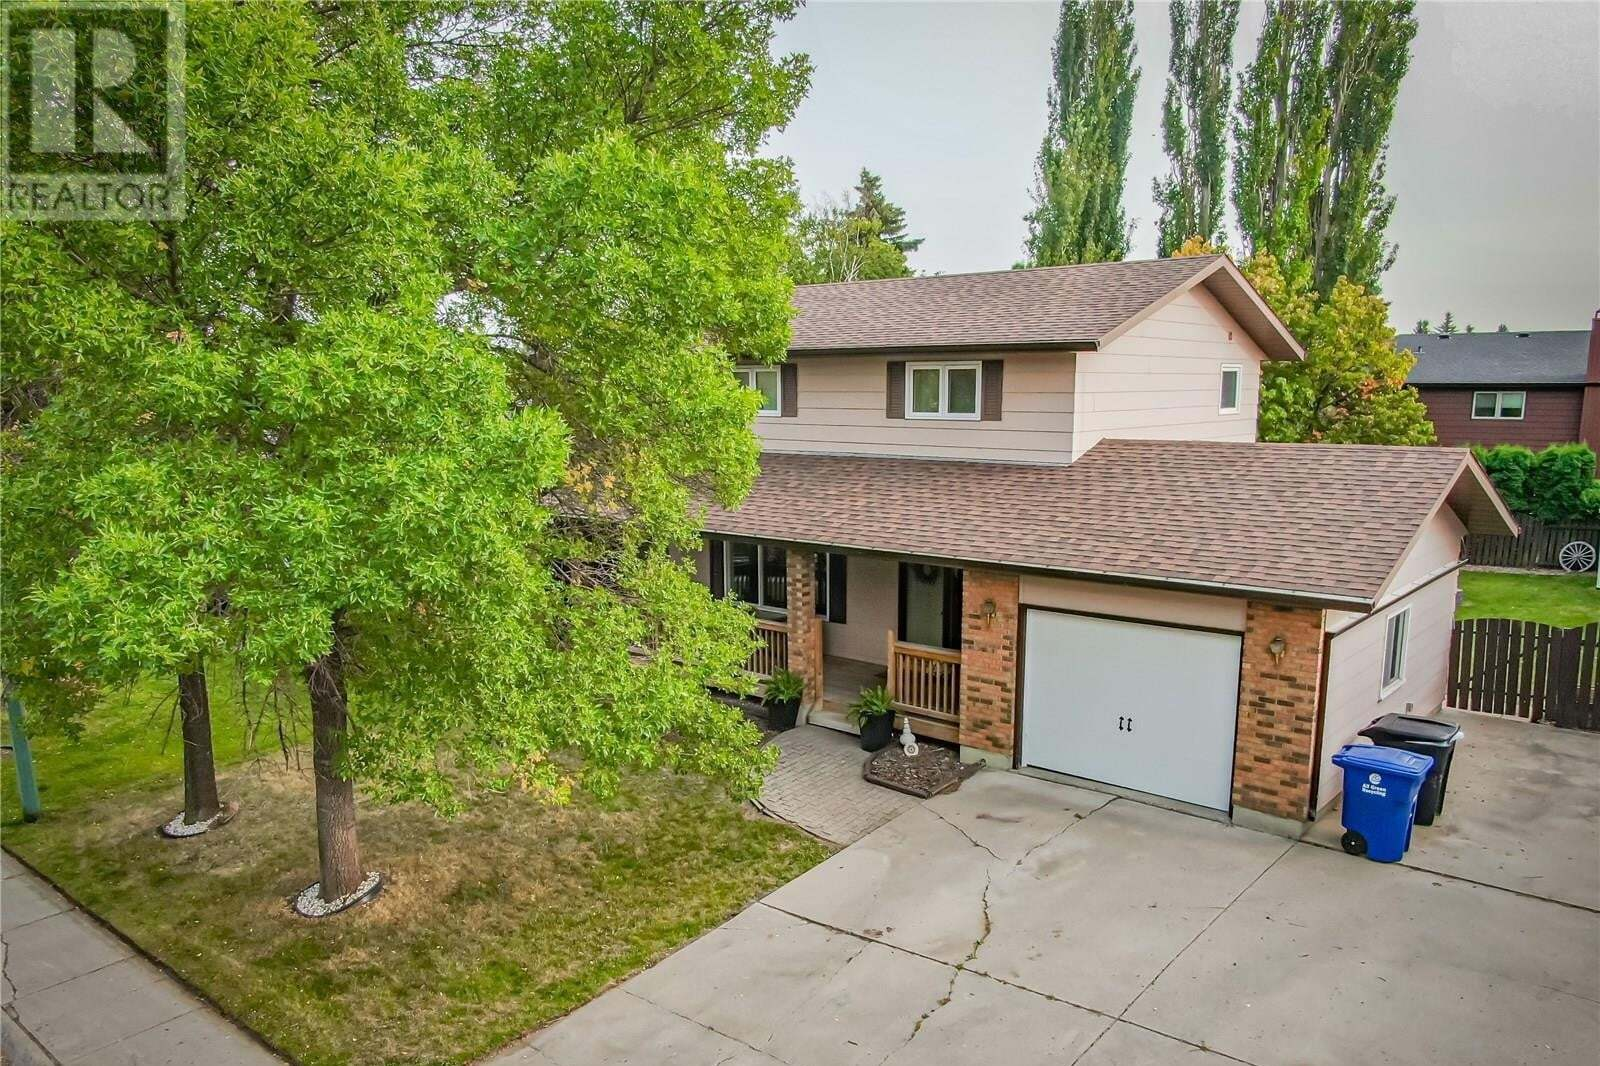 House for sale at 114 Stillwater Dr Saskatoon Saskatchewan - MLS: SK826945